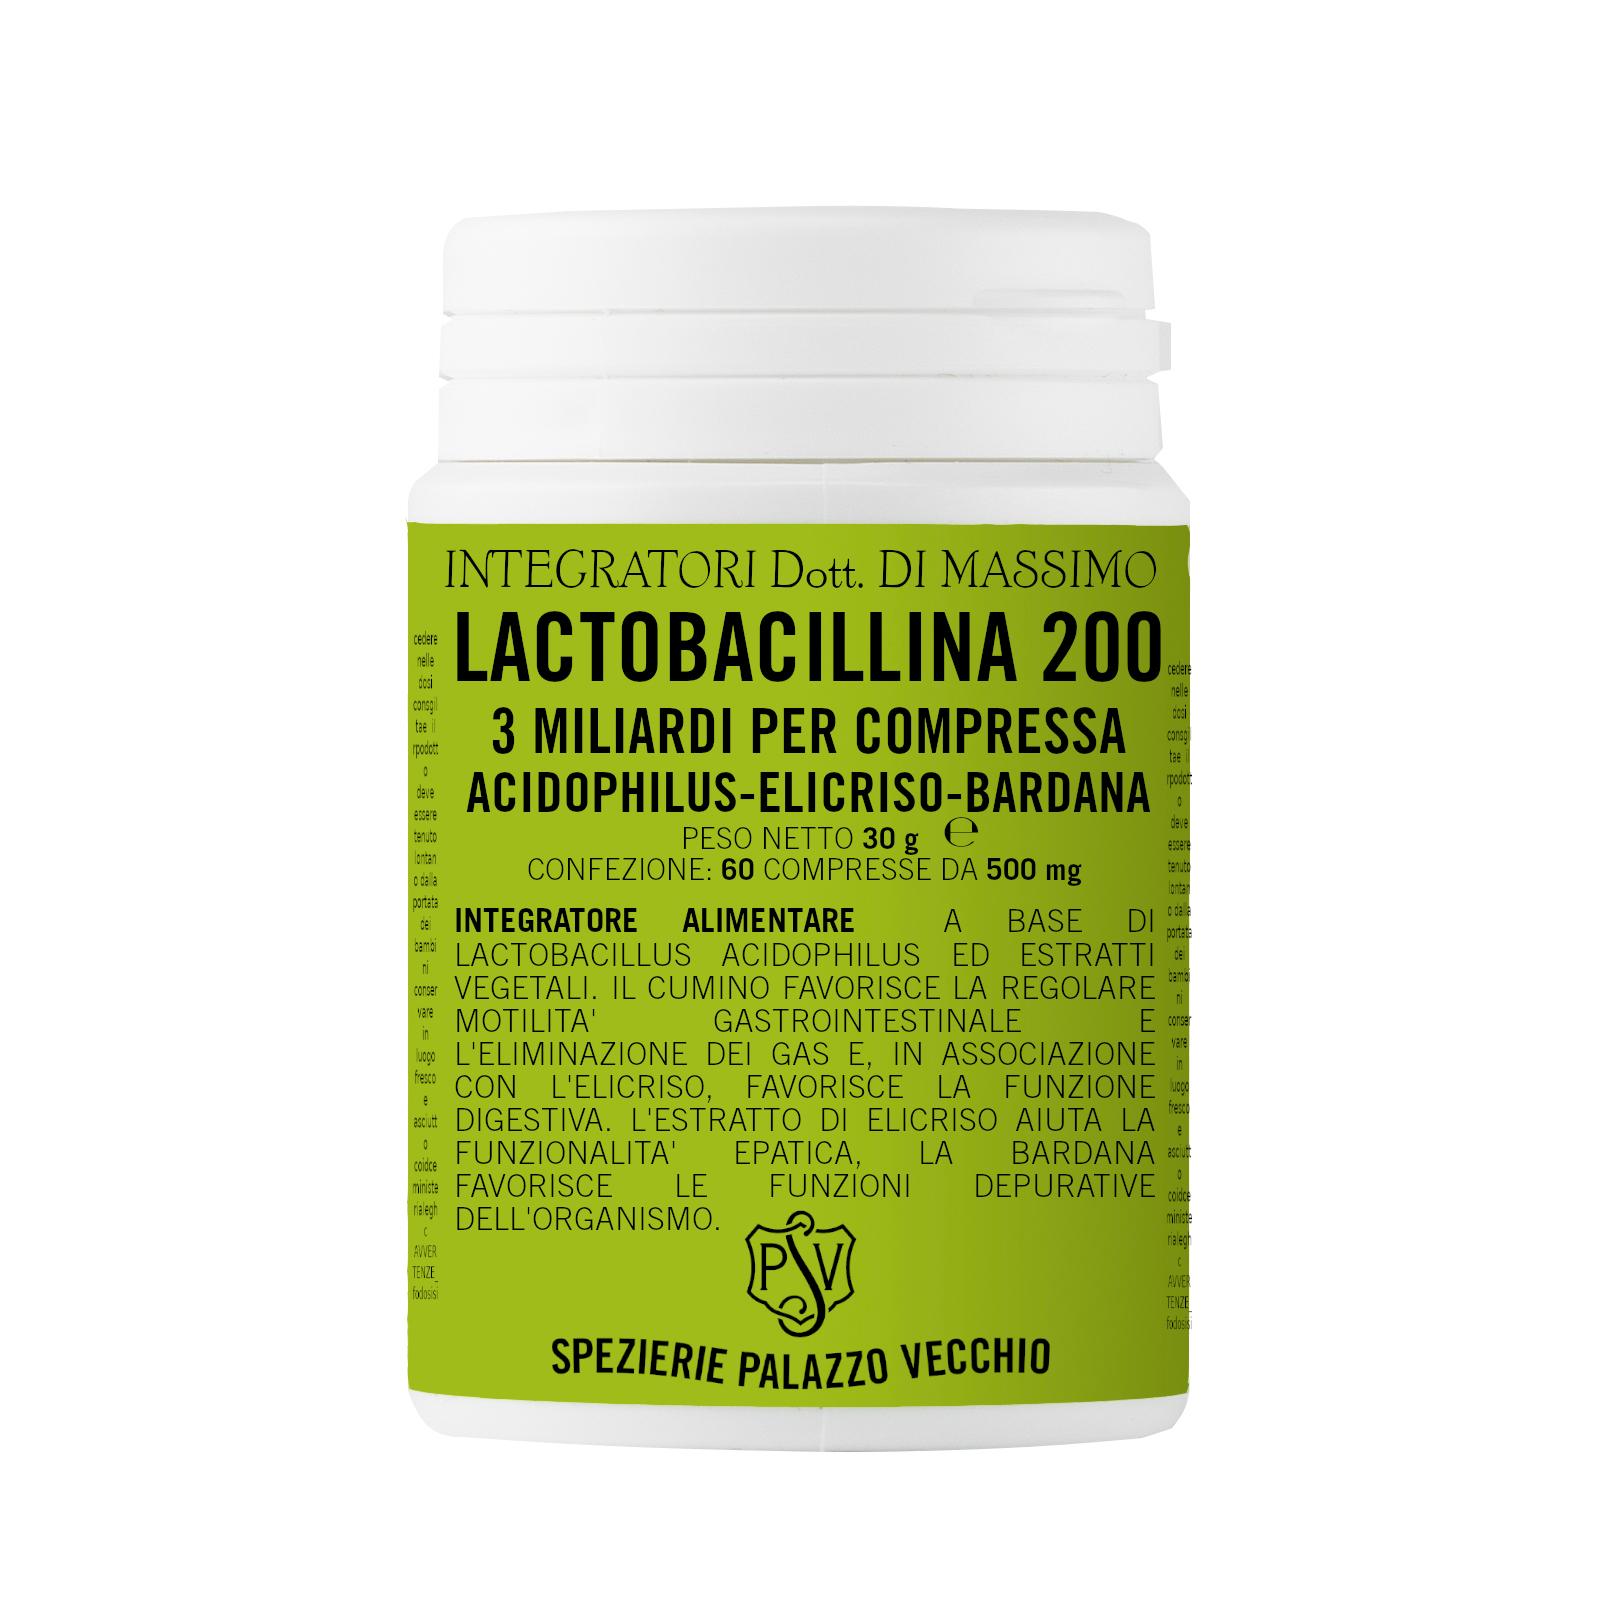 LACTOBACILLINA 200 Acidophilus-0